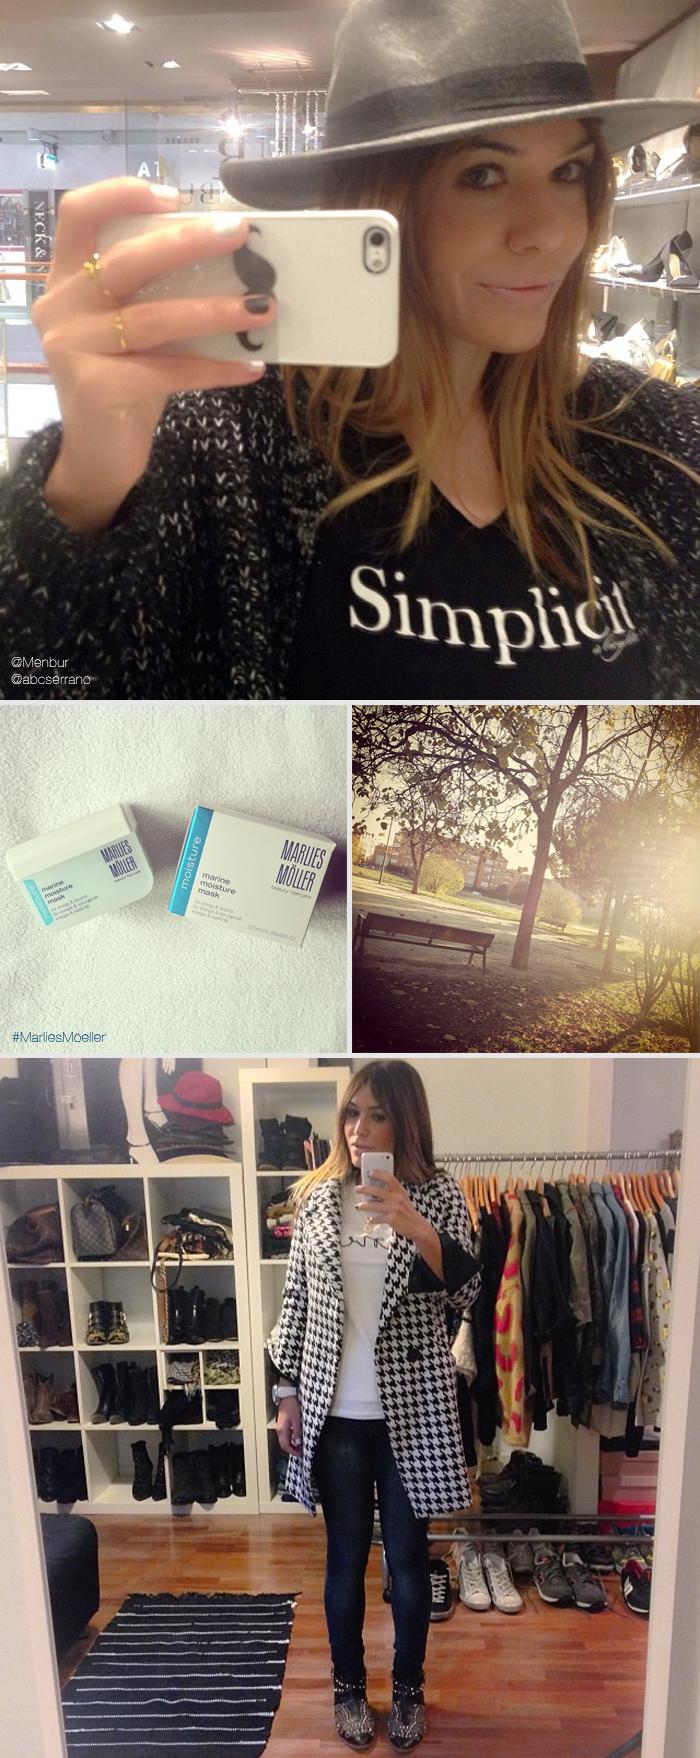 notes of the week barbara crespo tumblr instagram instavideo pics photography fashion blogger